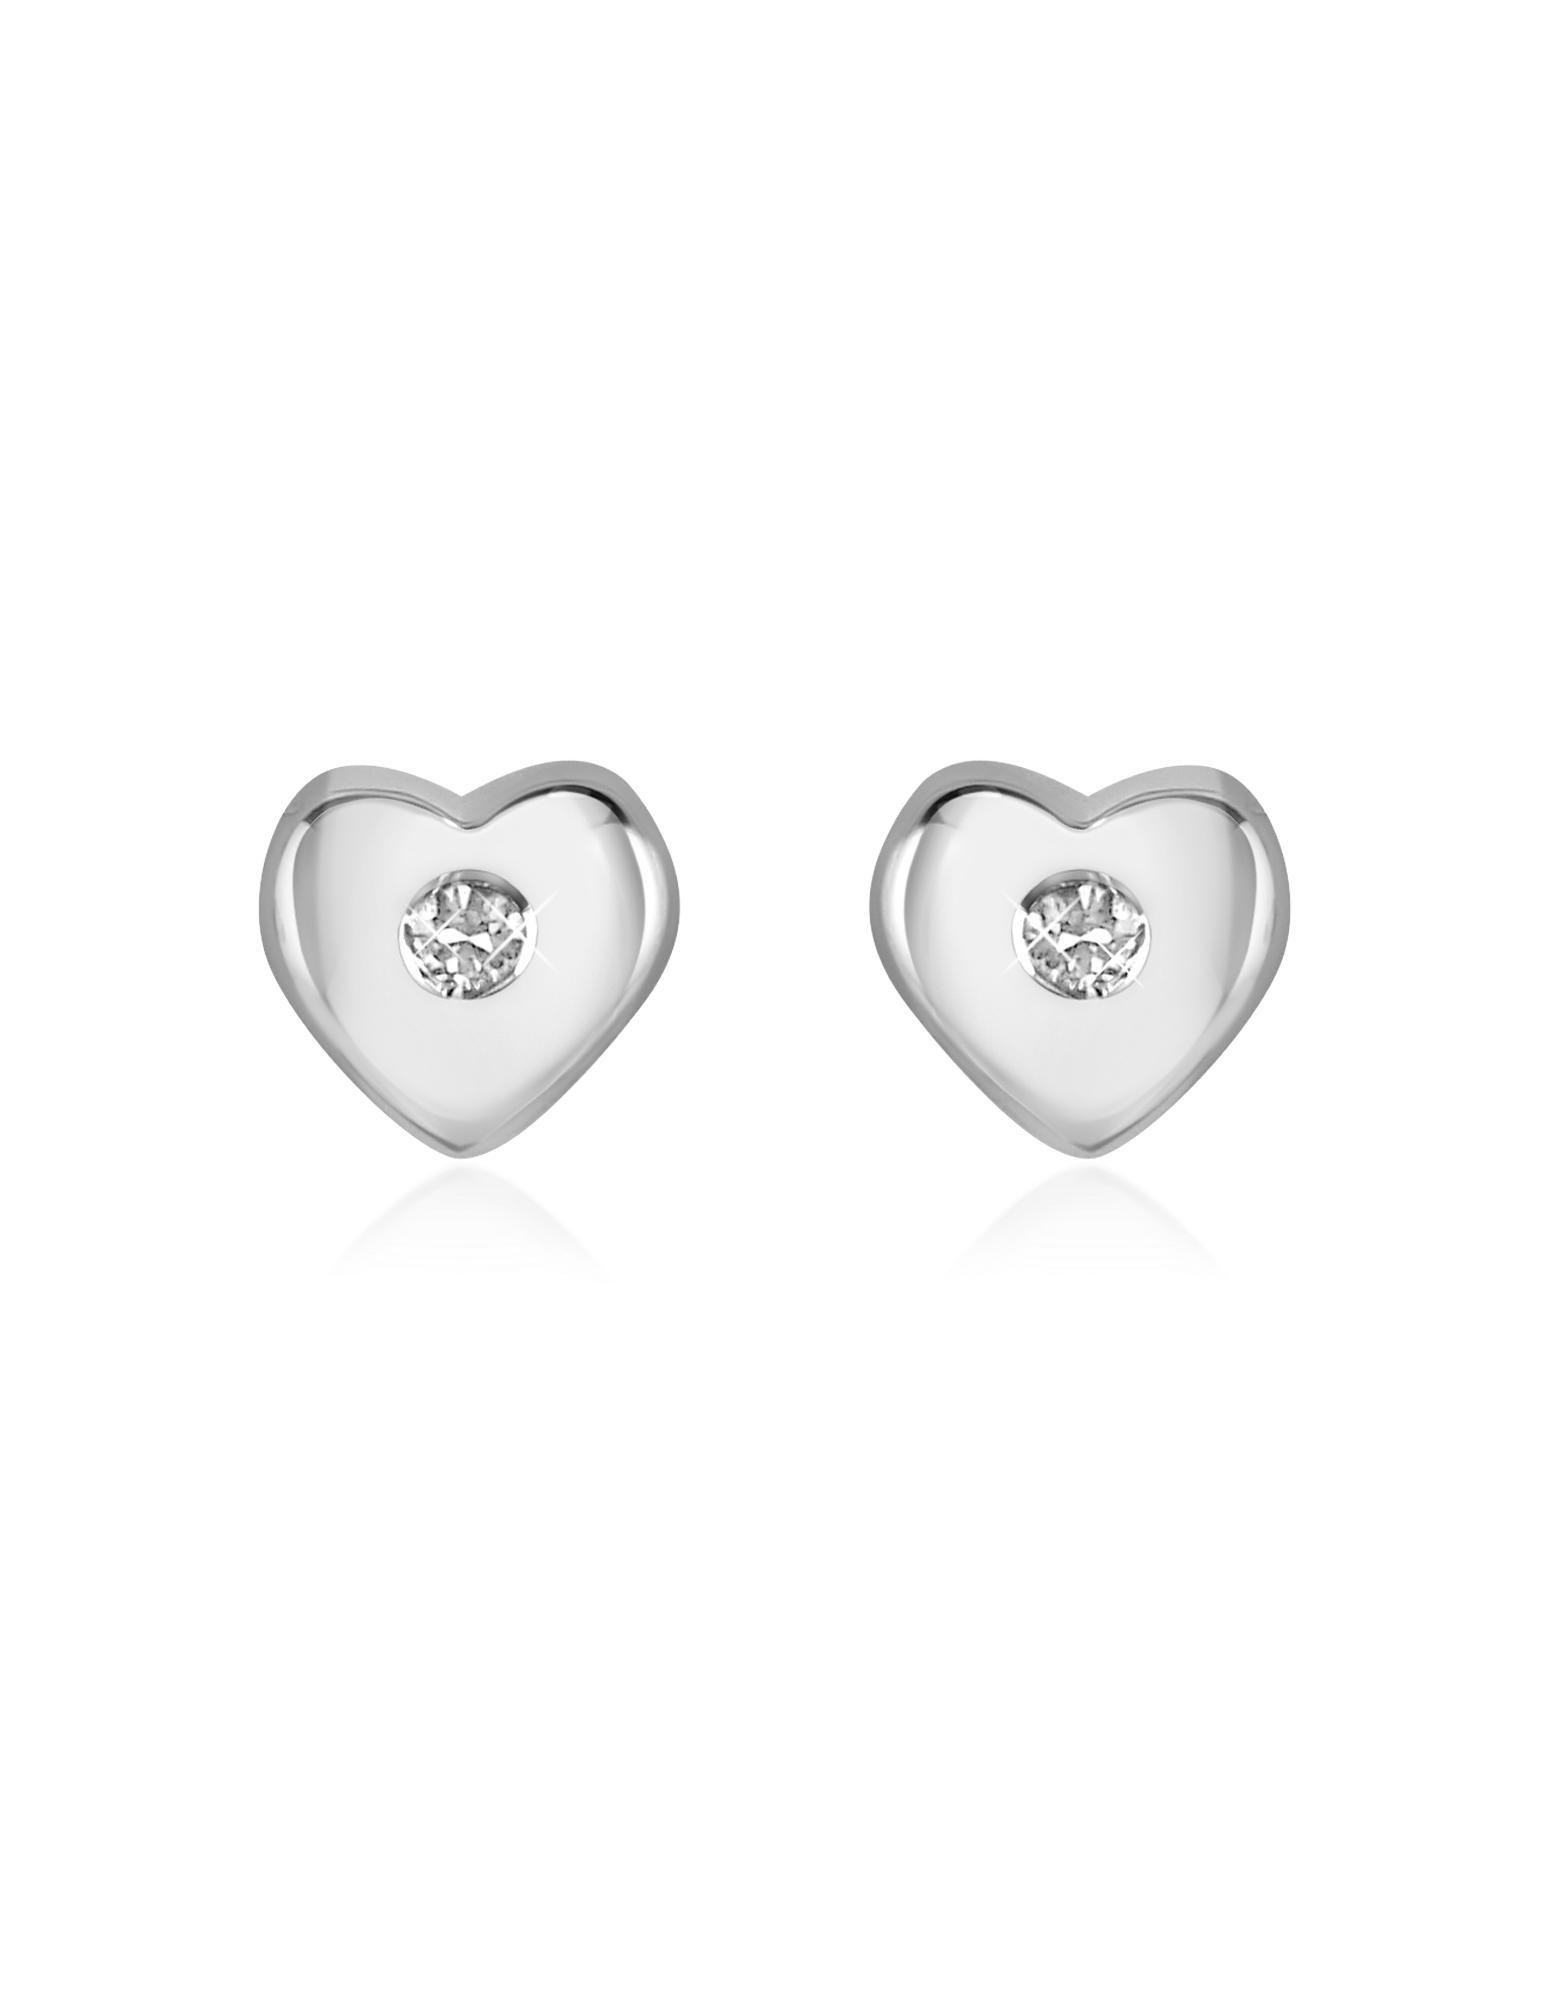 Forzieri  Princess - 0.055 ct Diamond Heart 18K Gold Earrings